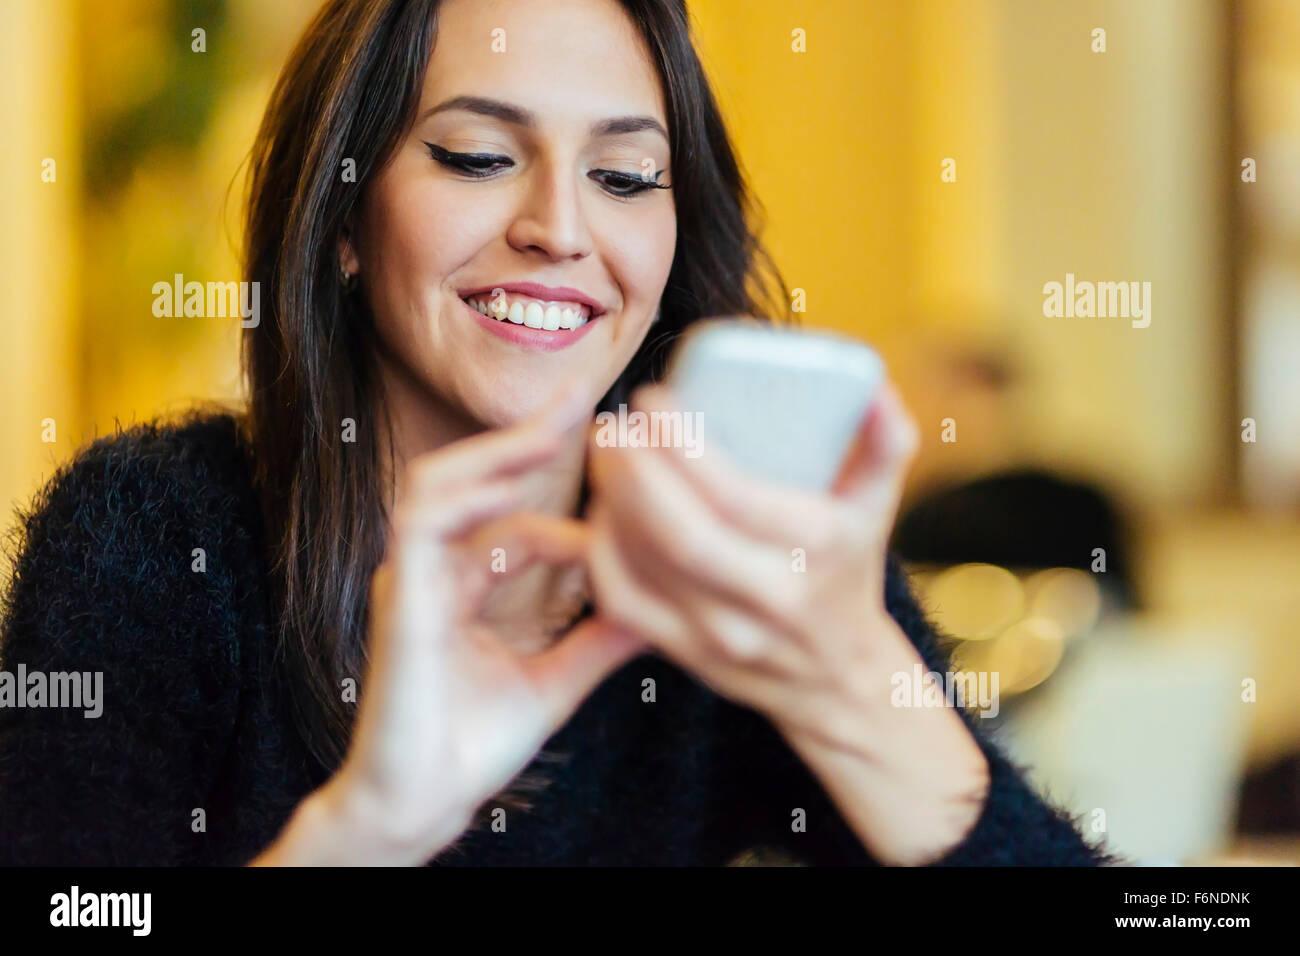 Schöne Brünette mit Smartphone Stockbild